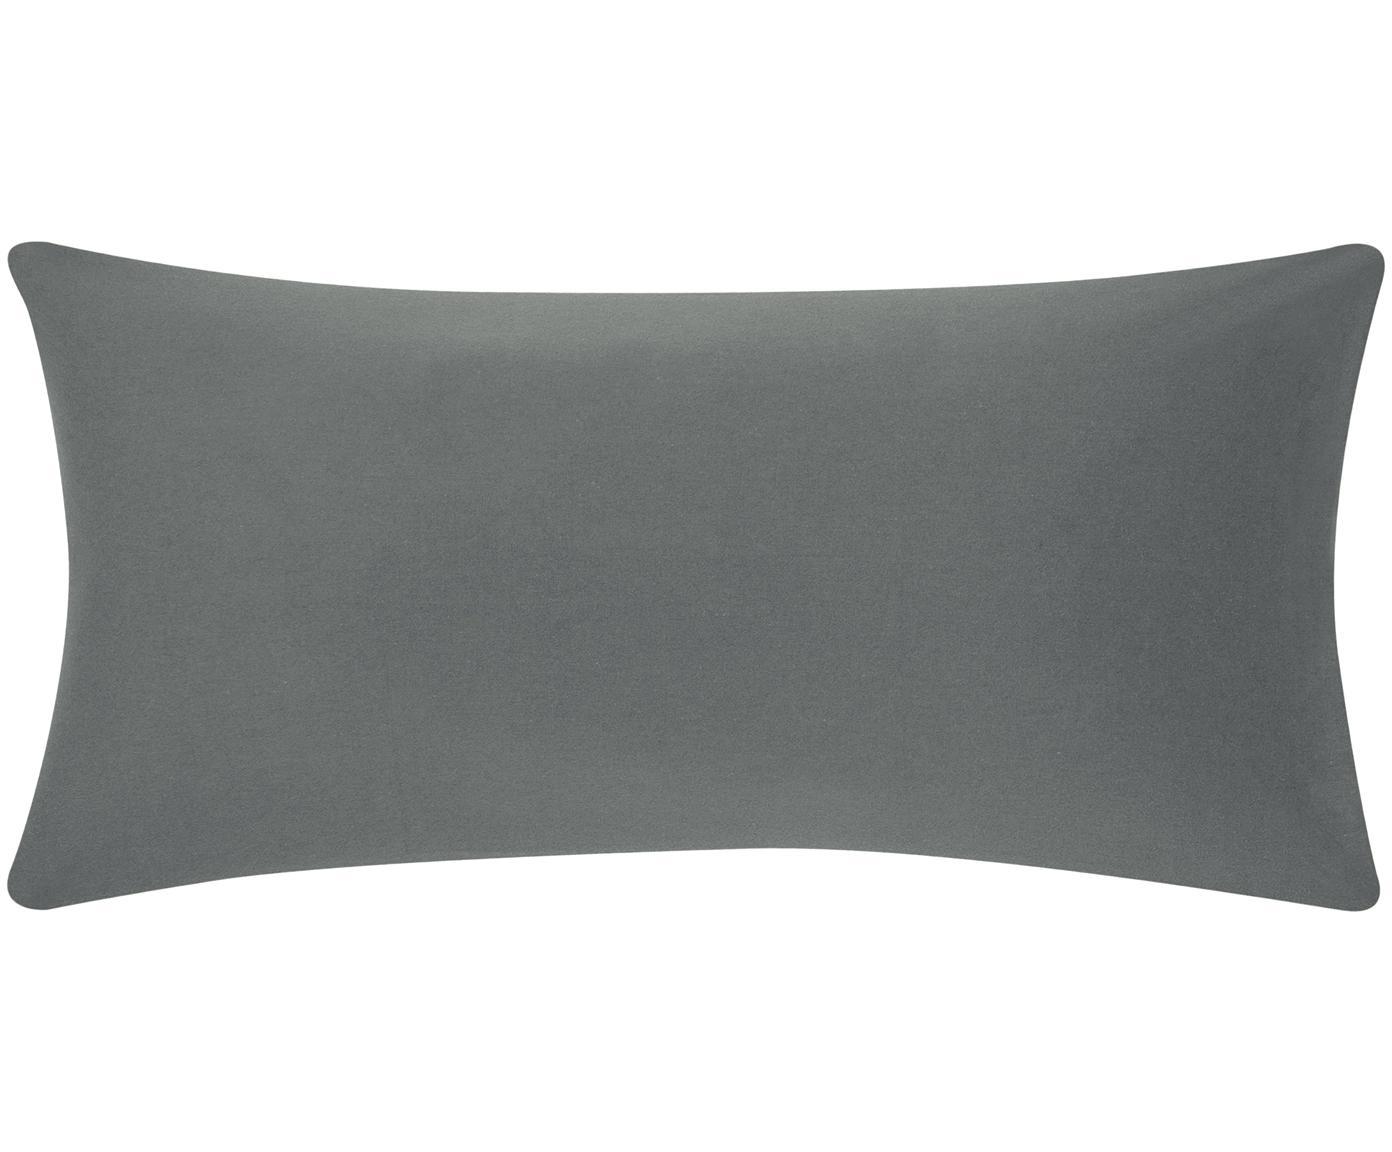 Flanell-Kissenbezüge Biba in Dunkelgrau, 2 Stück, Webart: Flanell Flanell ist ein s, Dunkelgrau, 40 x 80 cm